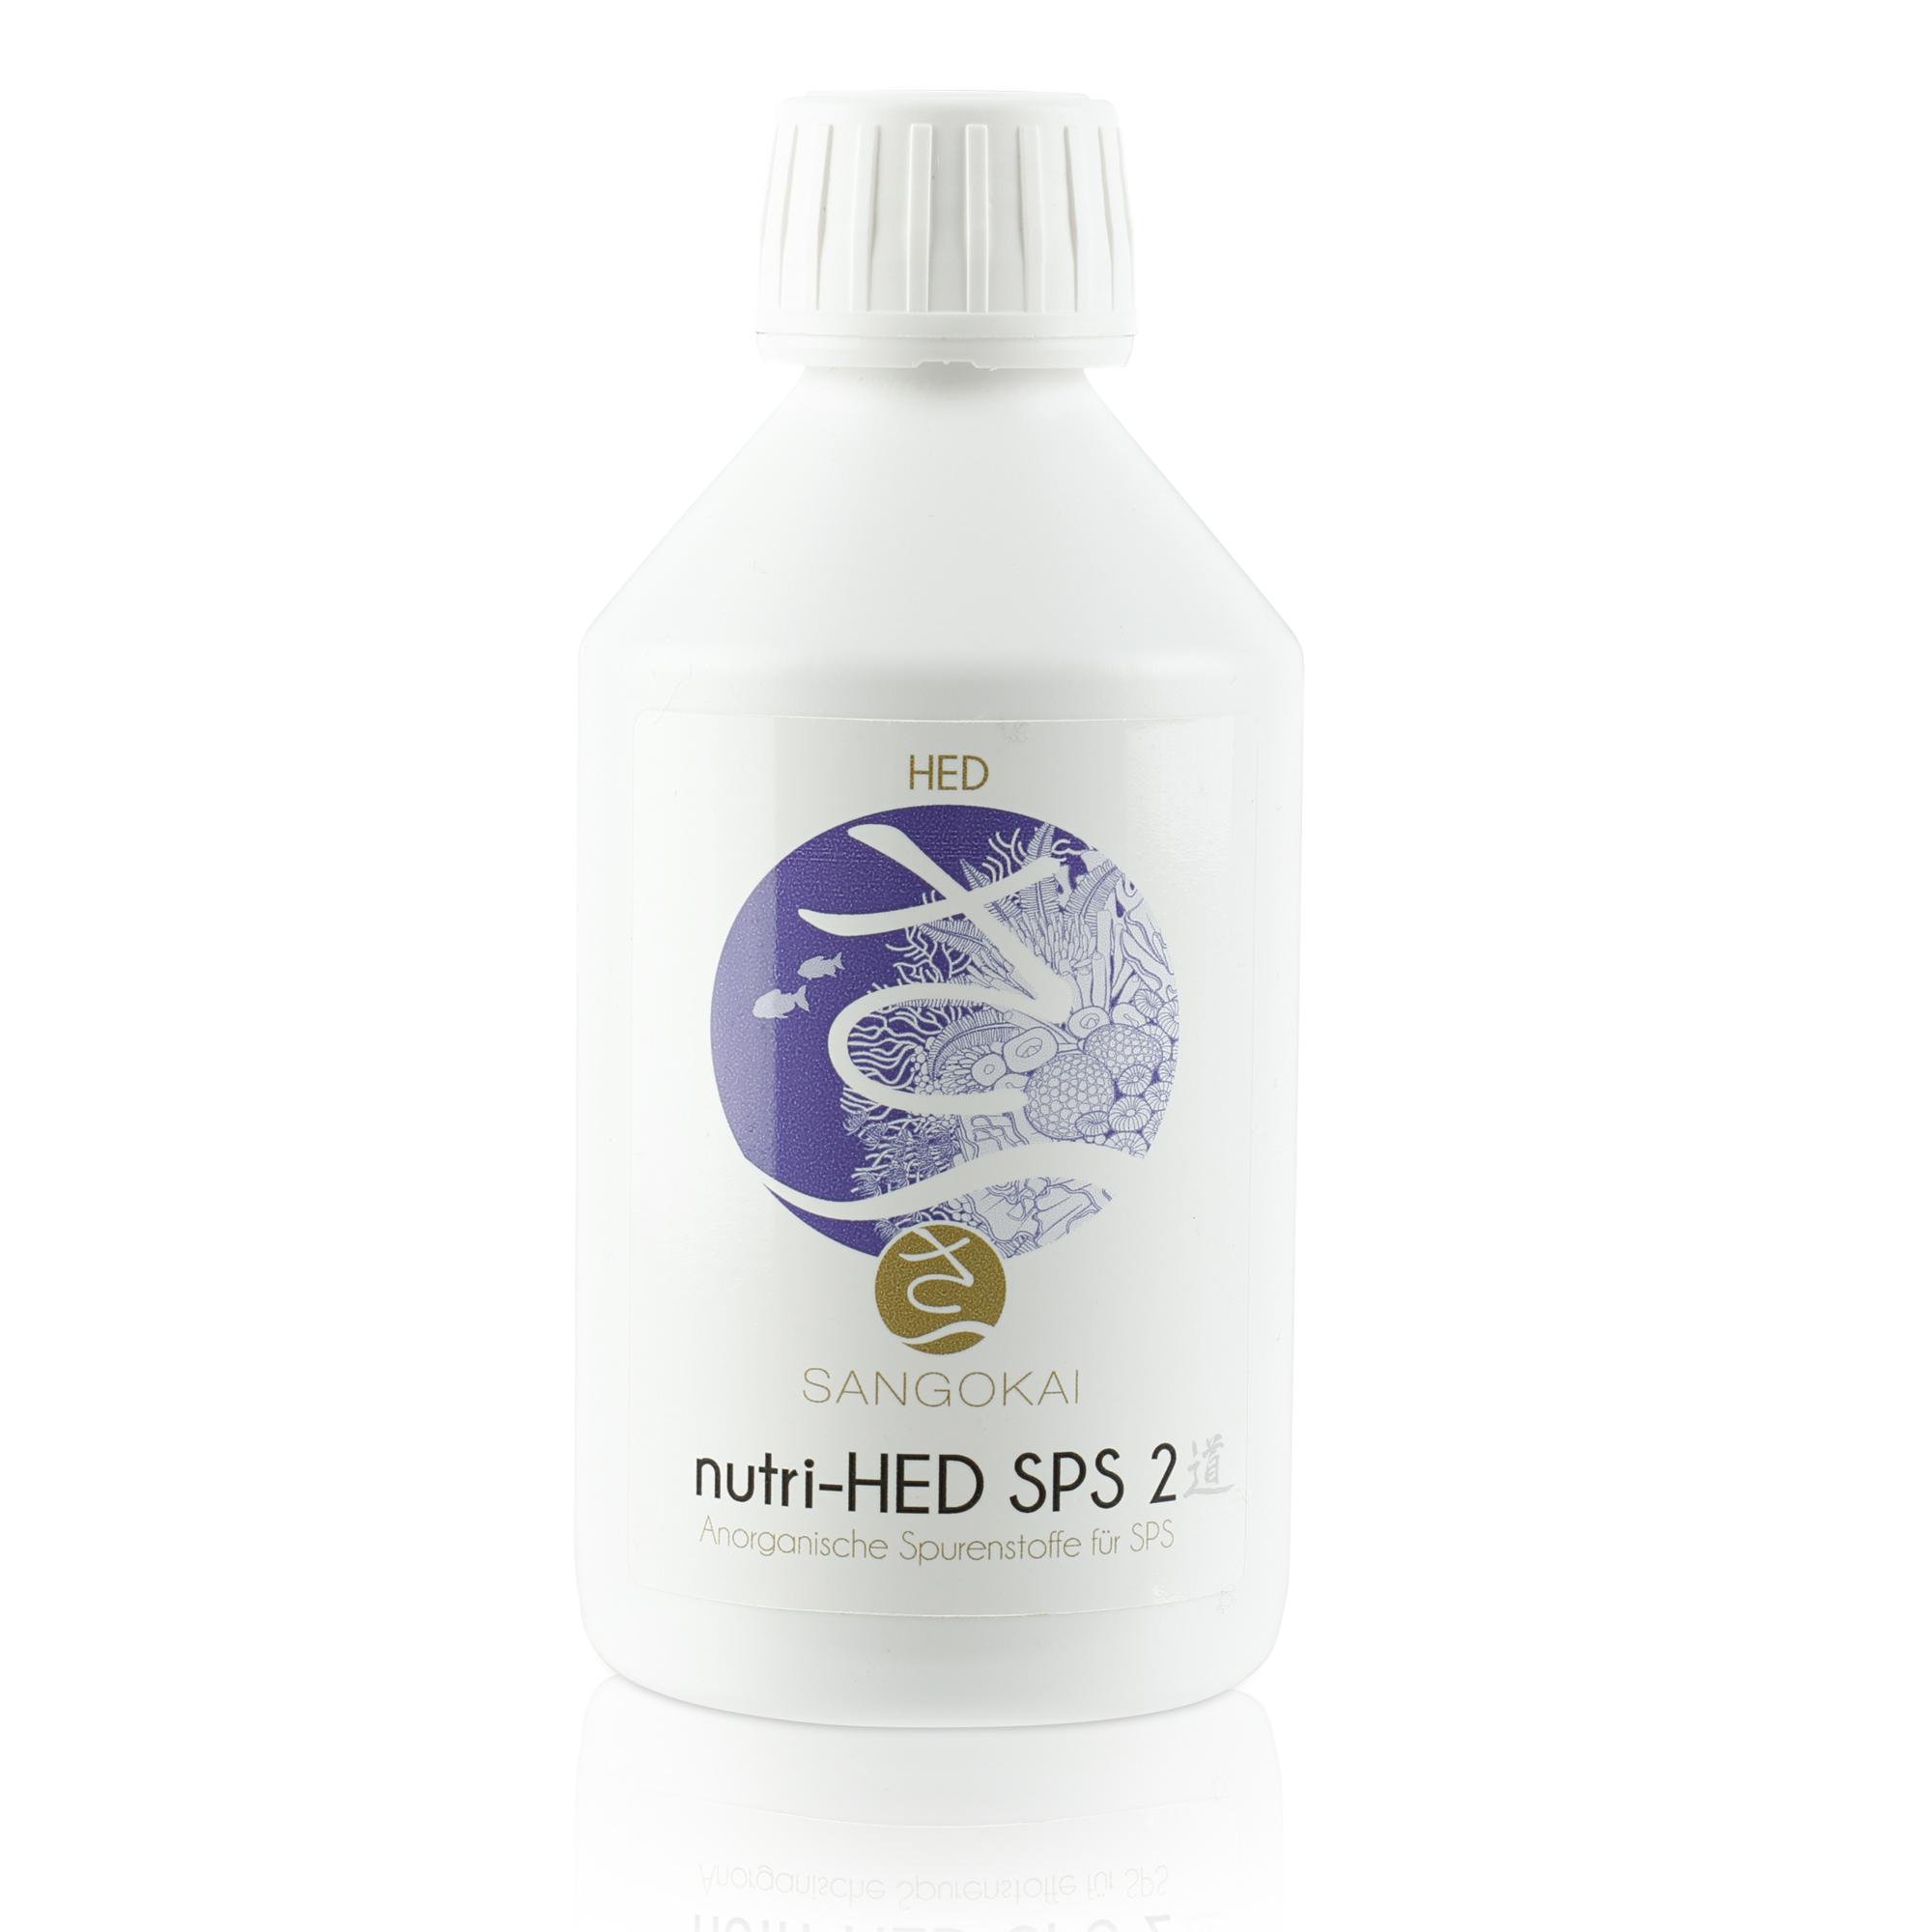 Sangokai Sango Nutri-HED 2 partikuläre Nährstoffe 250ml